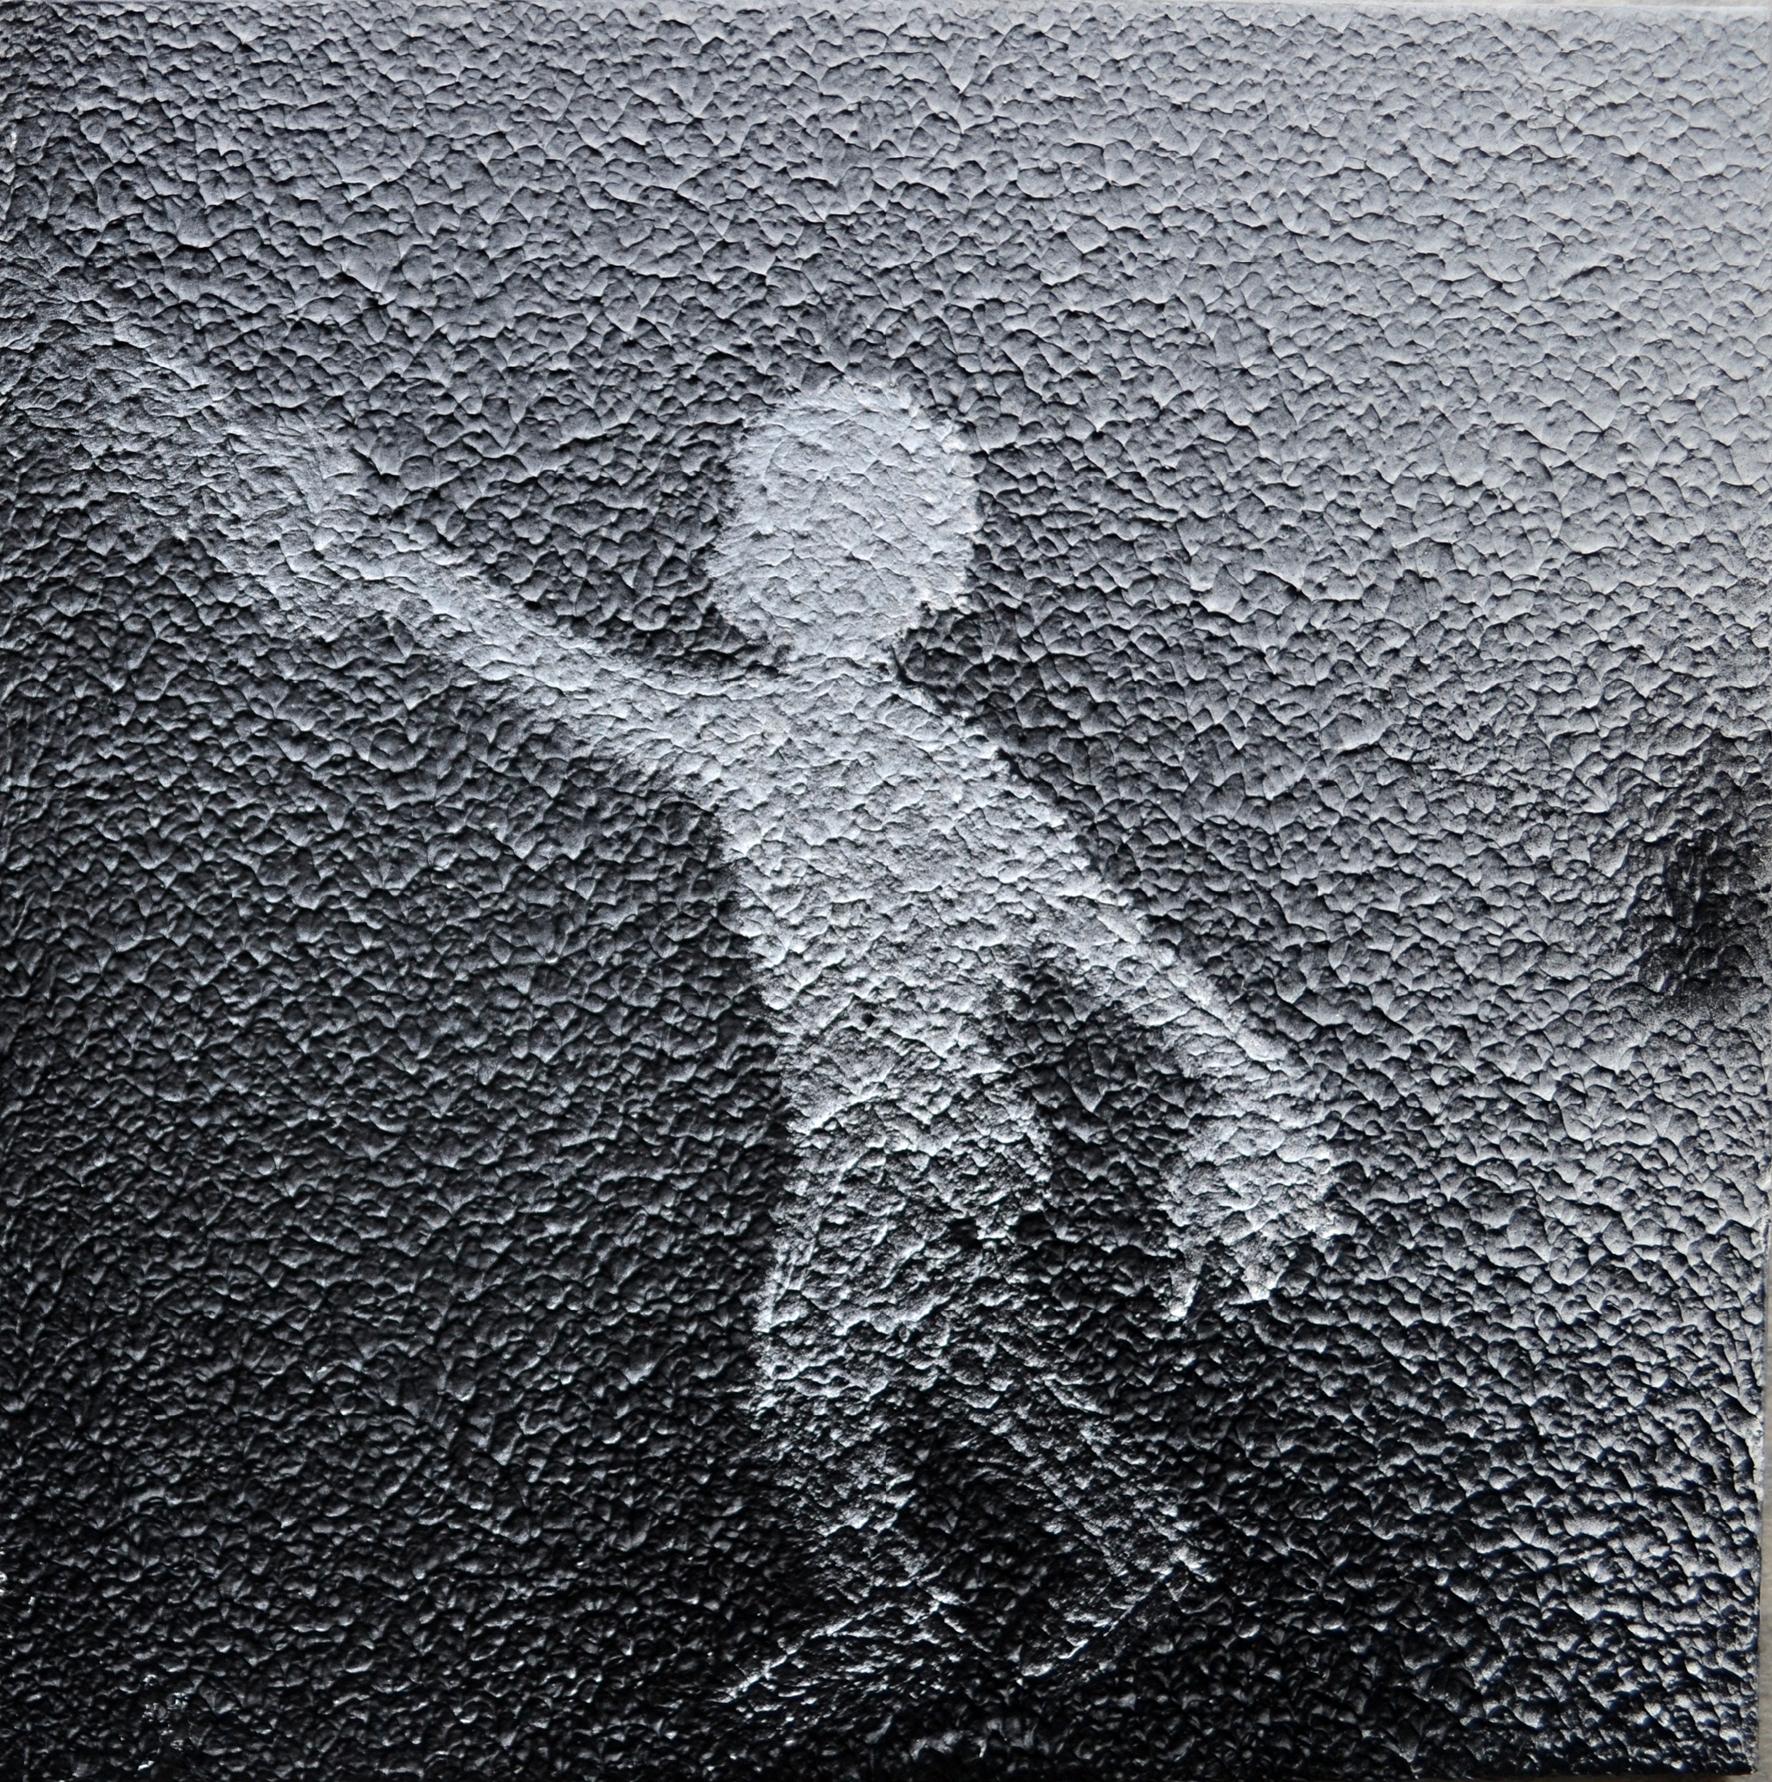 Child, 40 x 40 cm, Mixed media, 2017